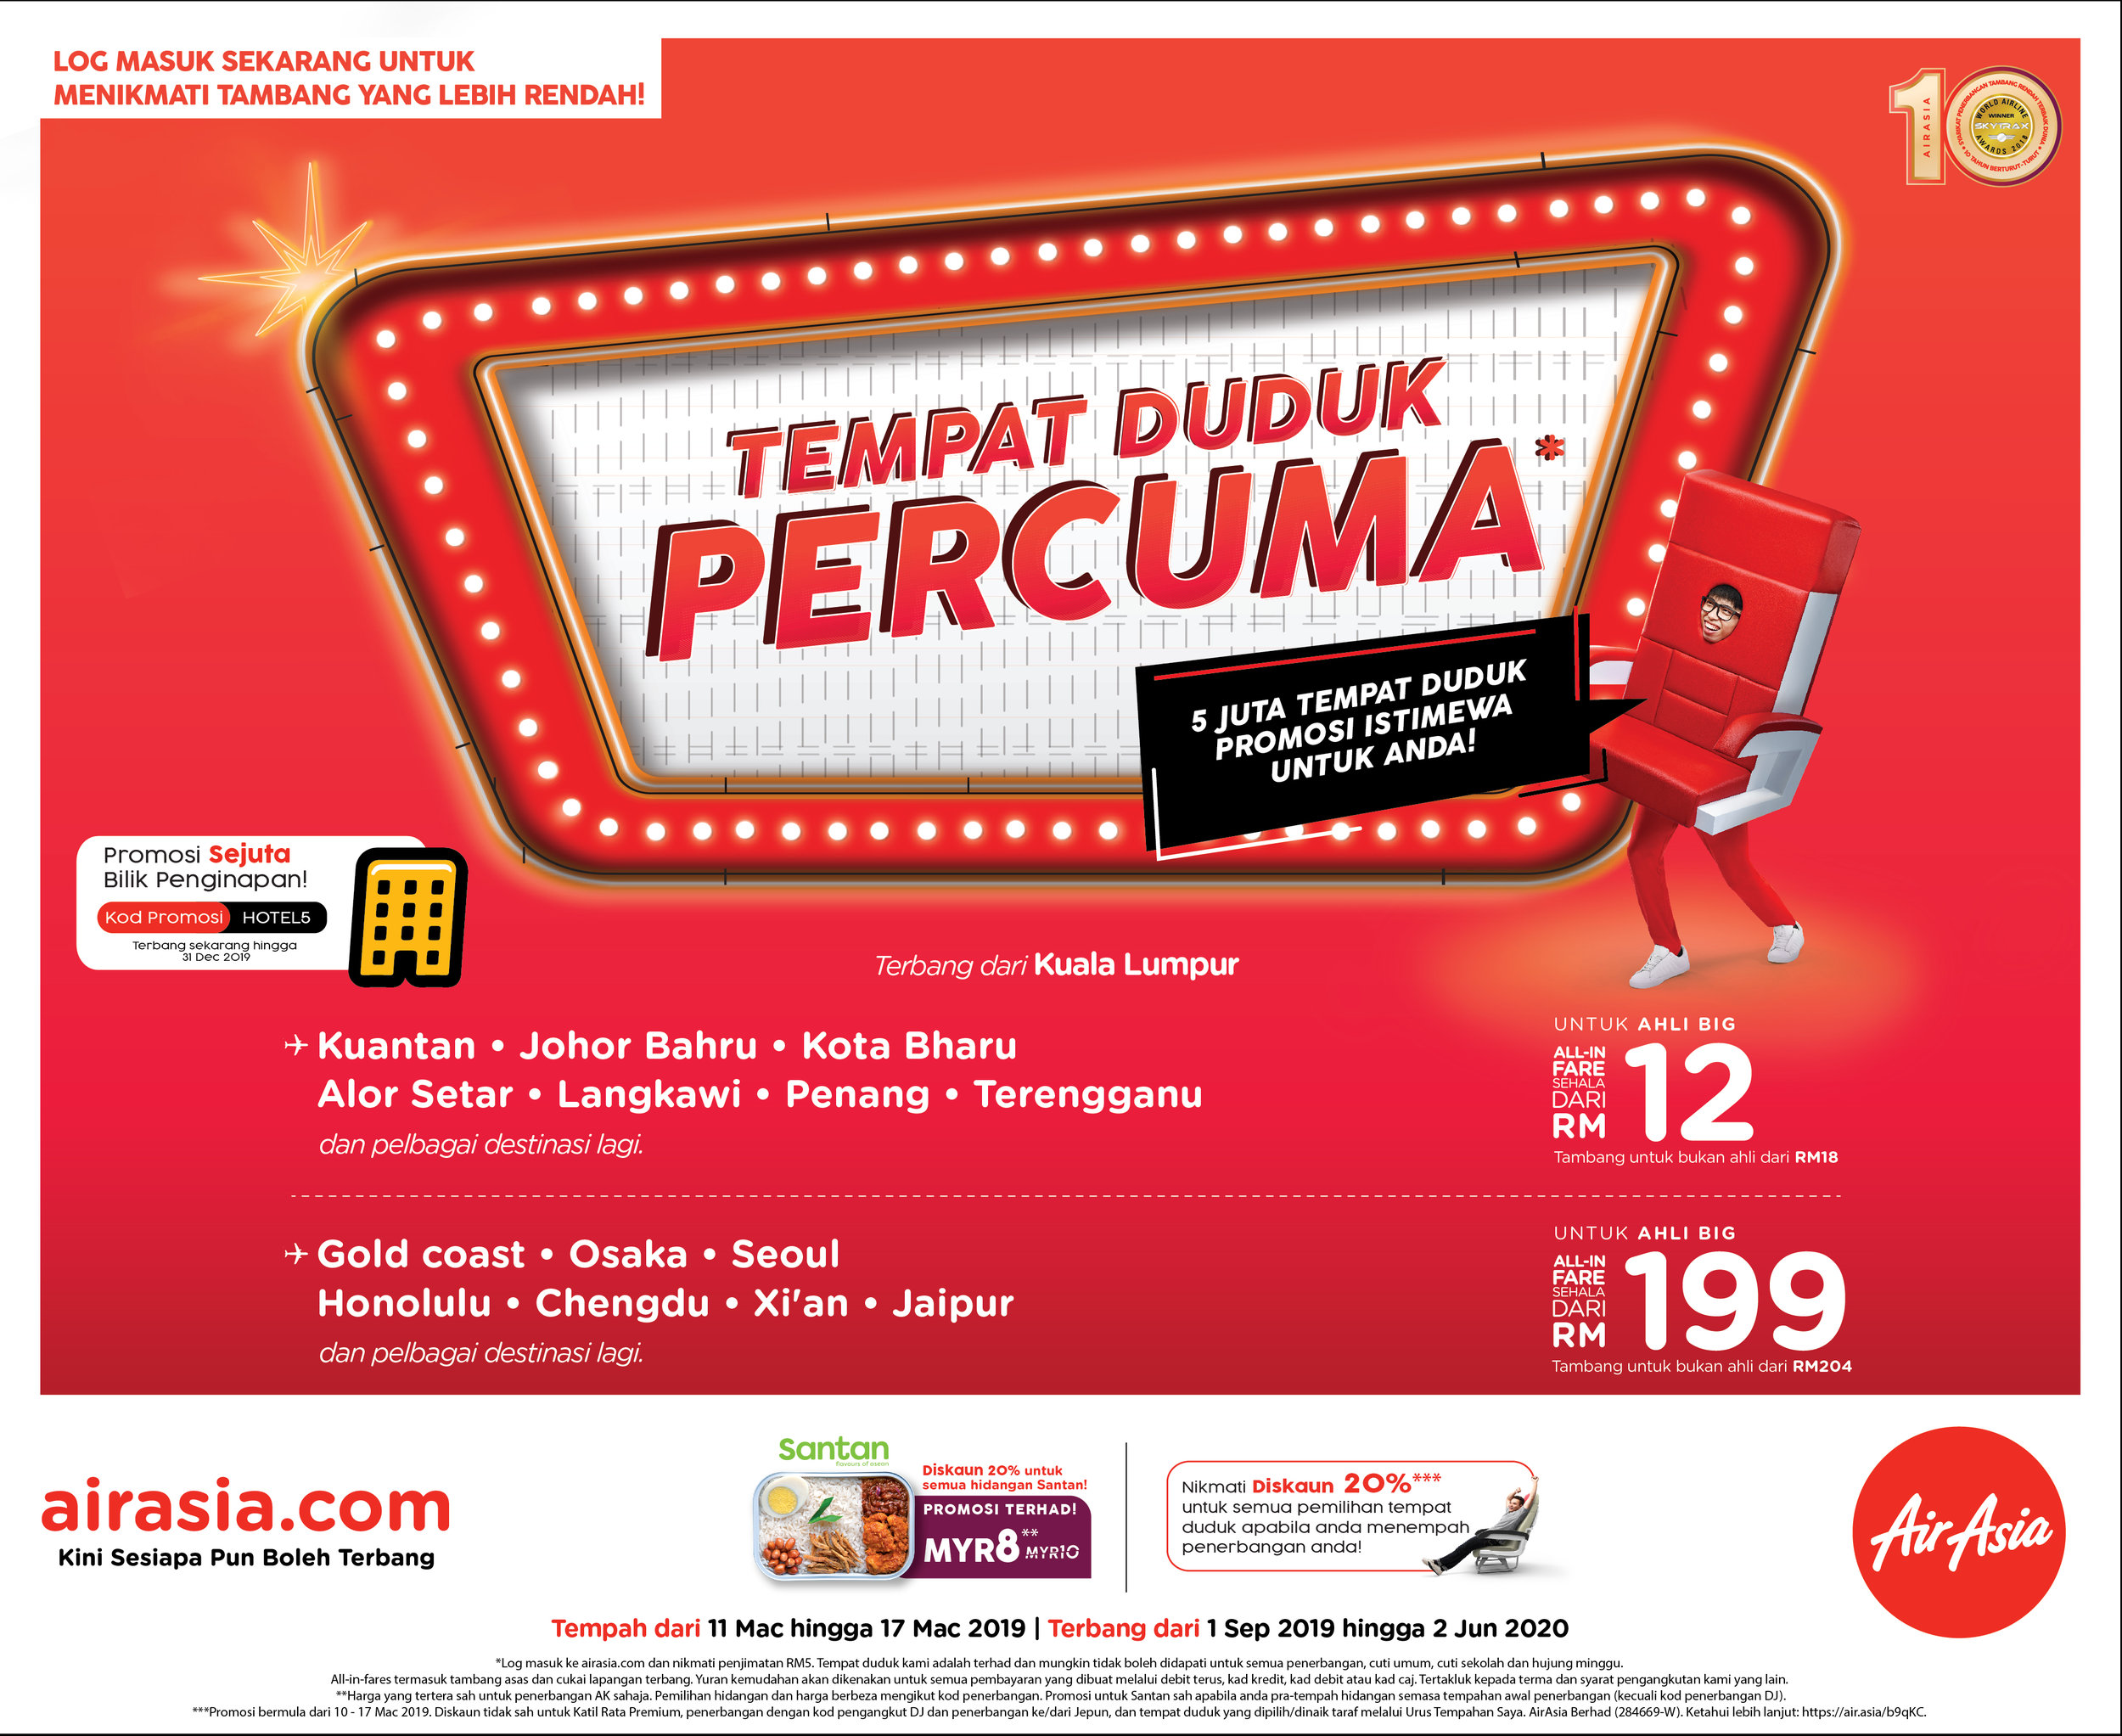 AirAsia Free Seats - BM.jpg